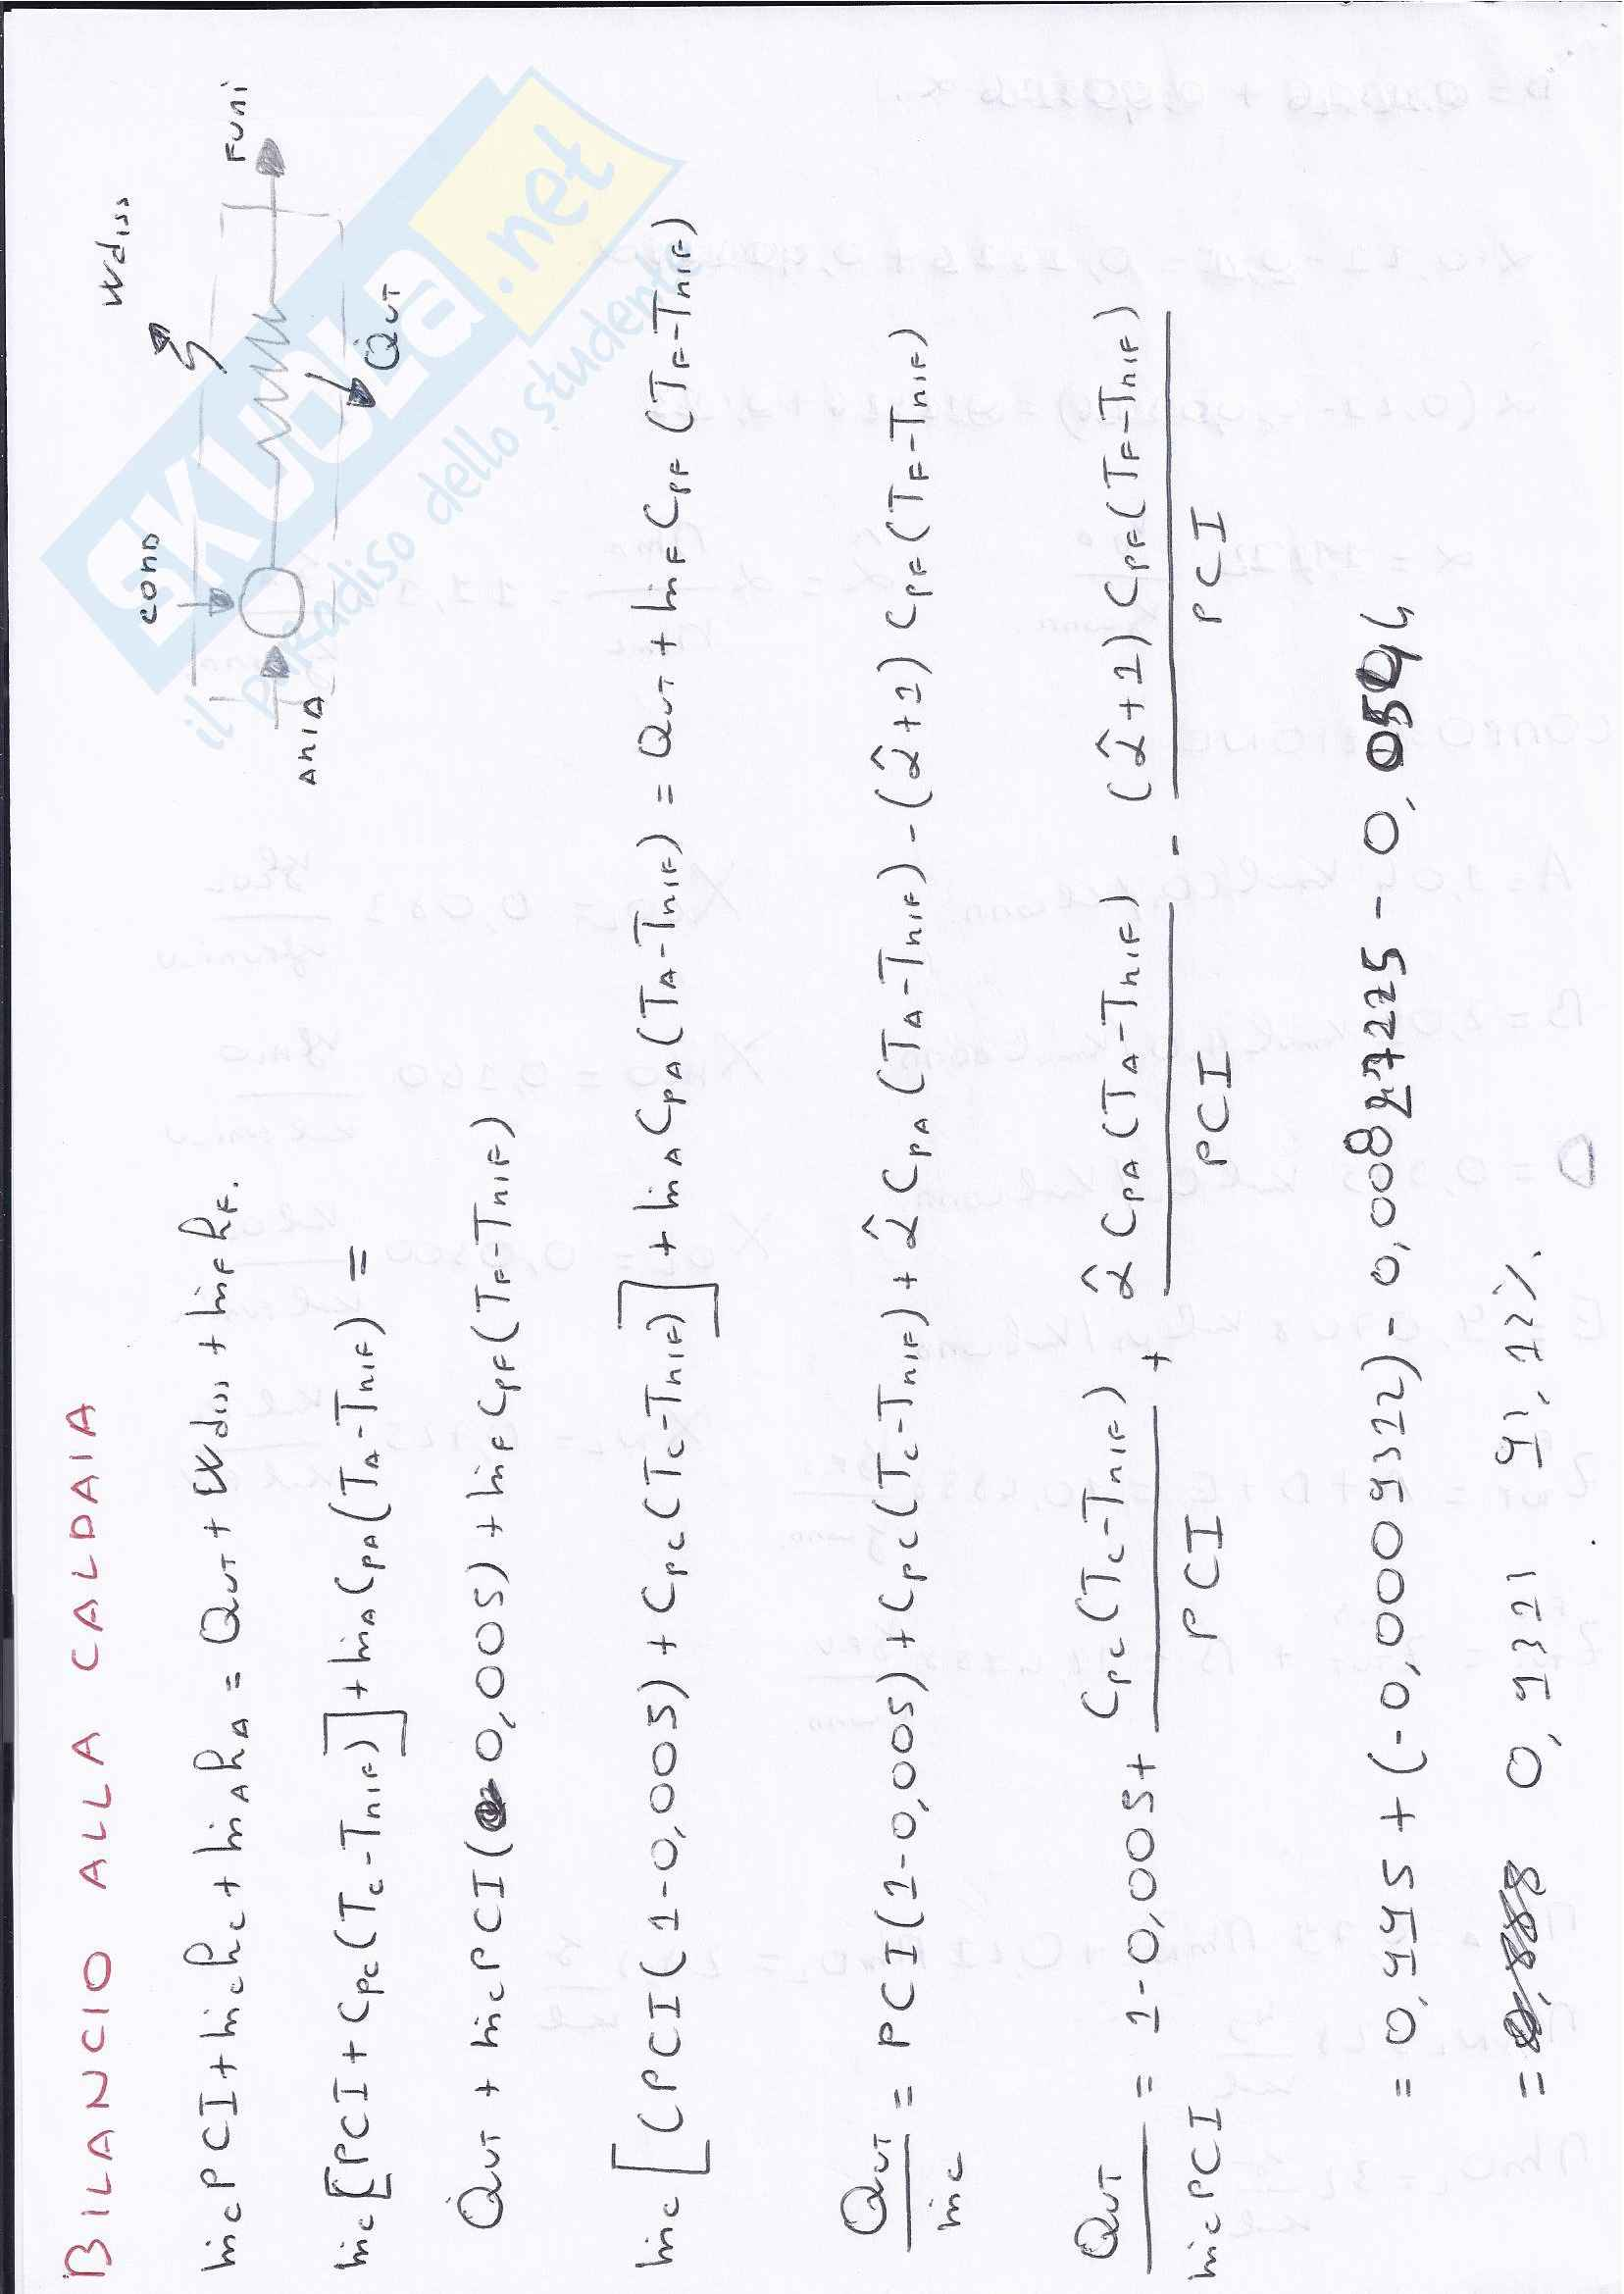 Sistemi energetici - esame giugno 2011 Pag. 6